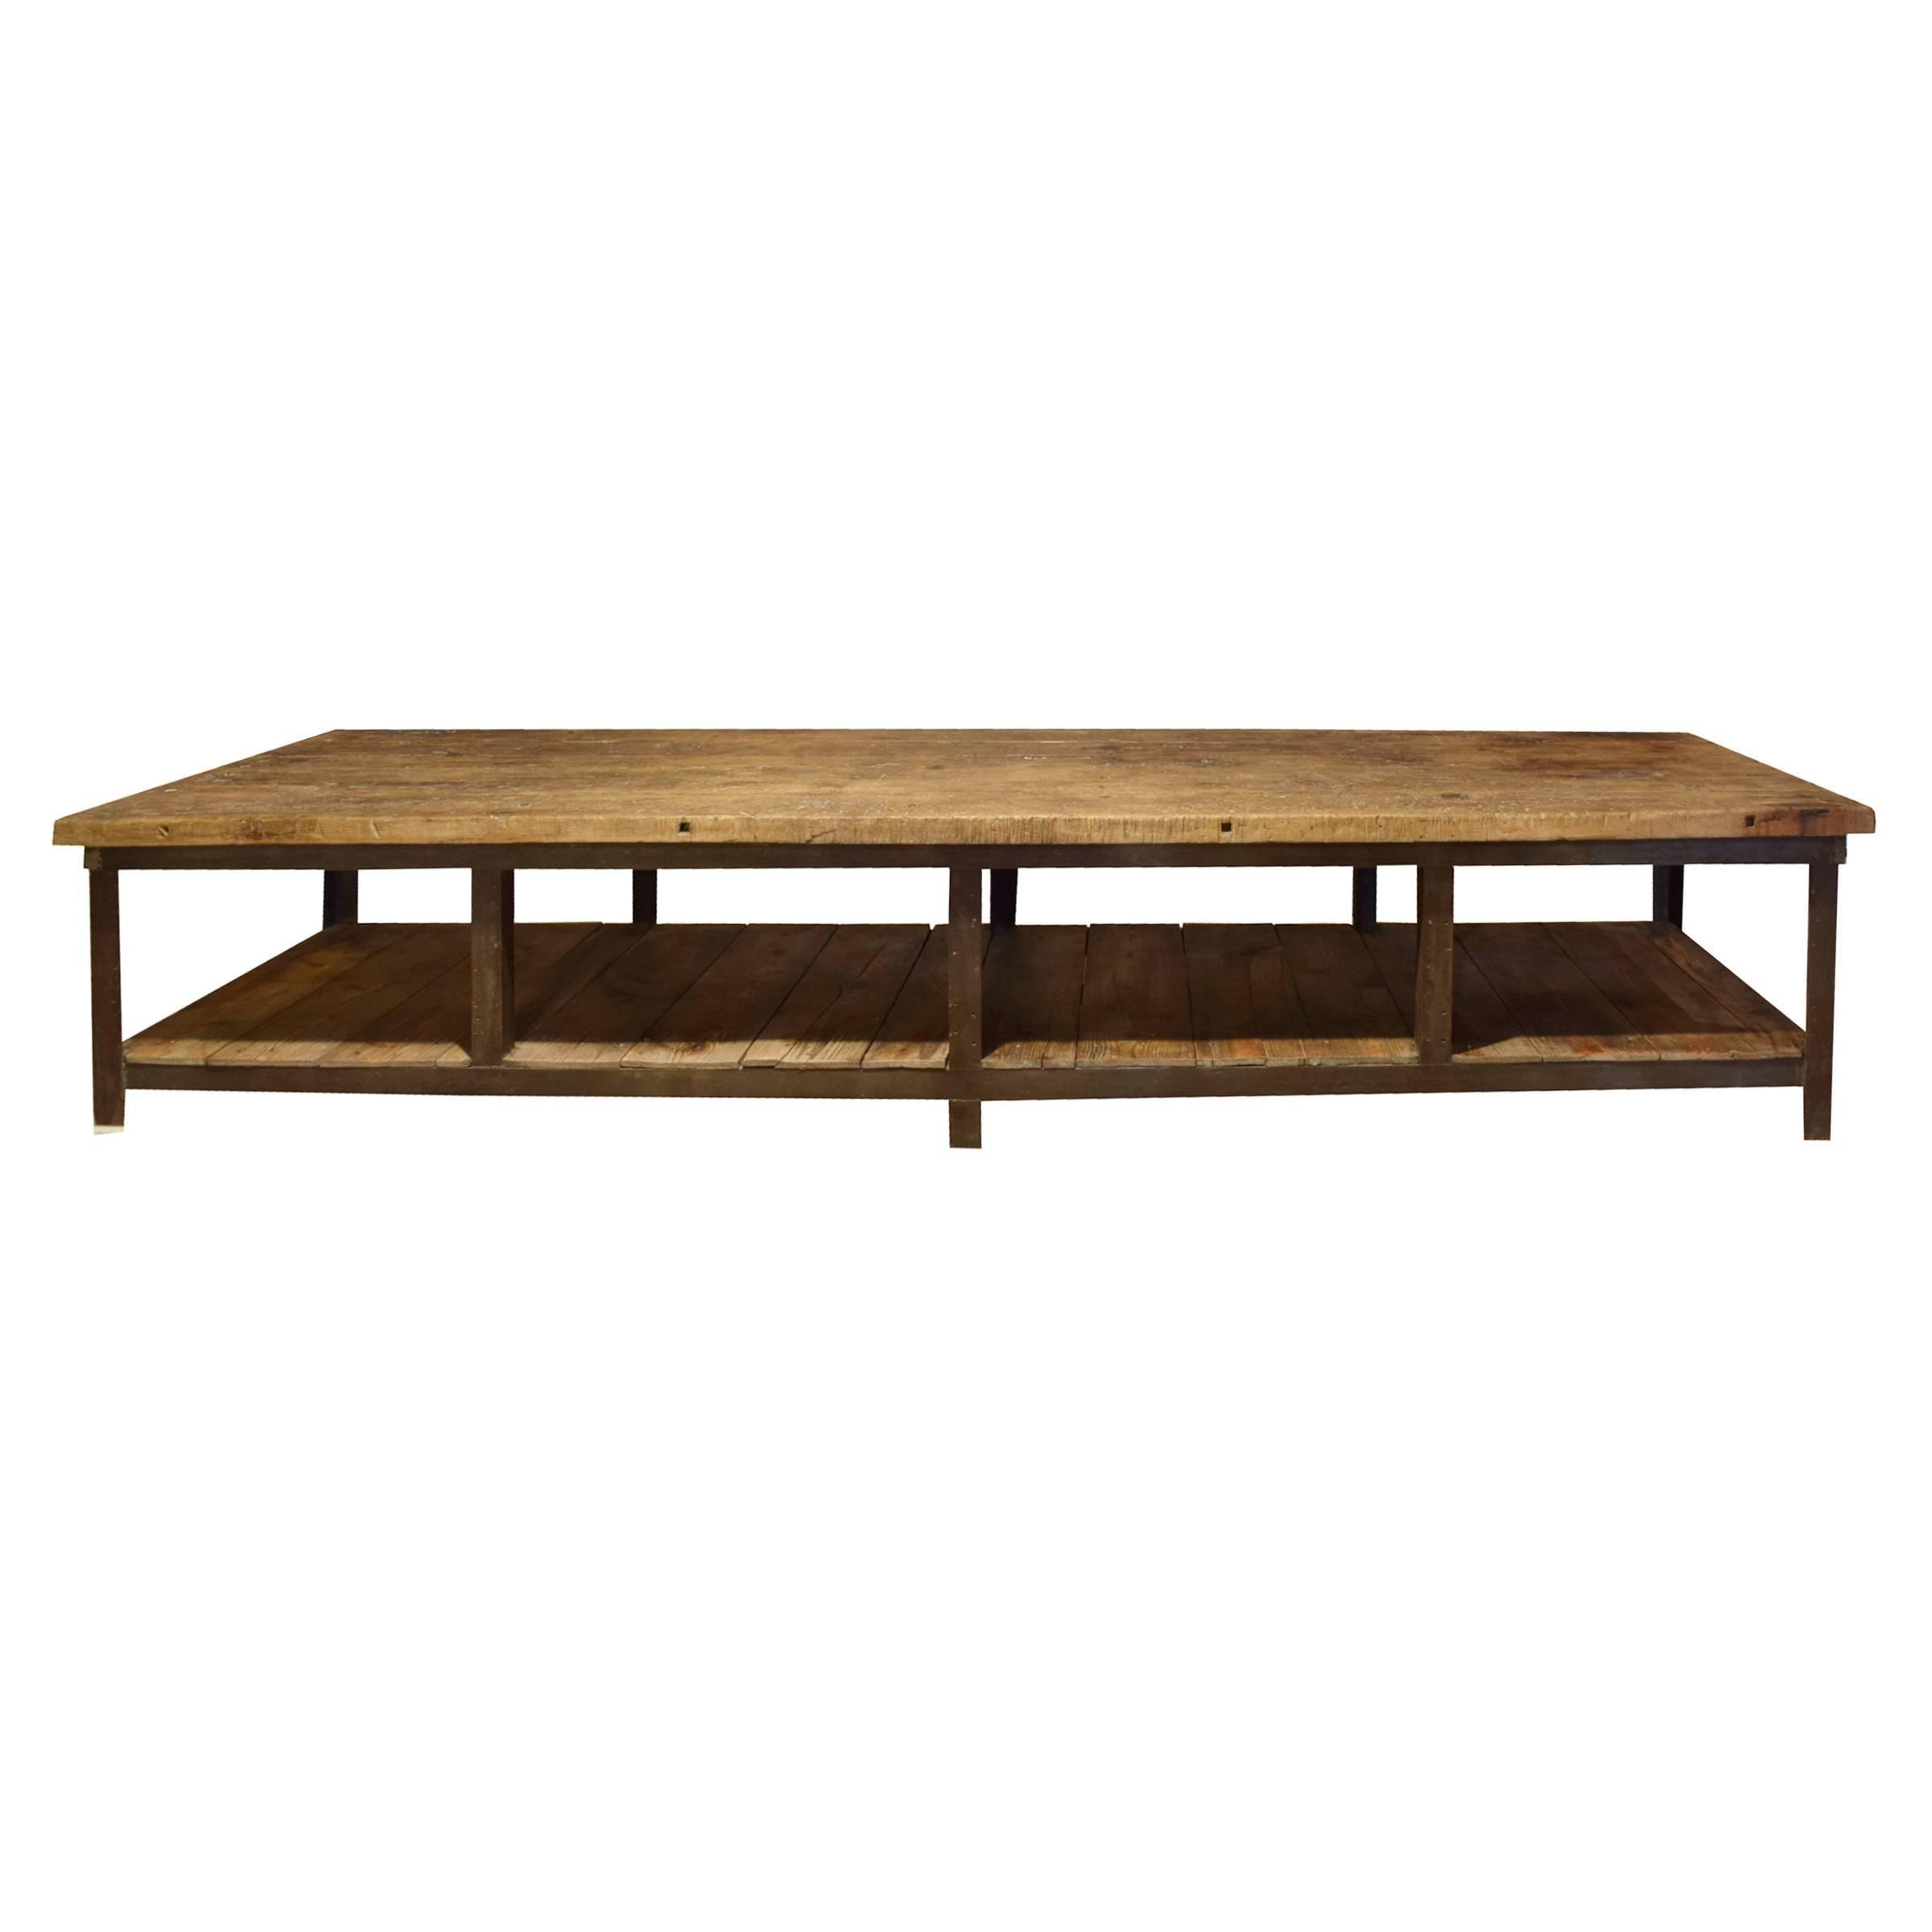 American Industrial Table